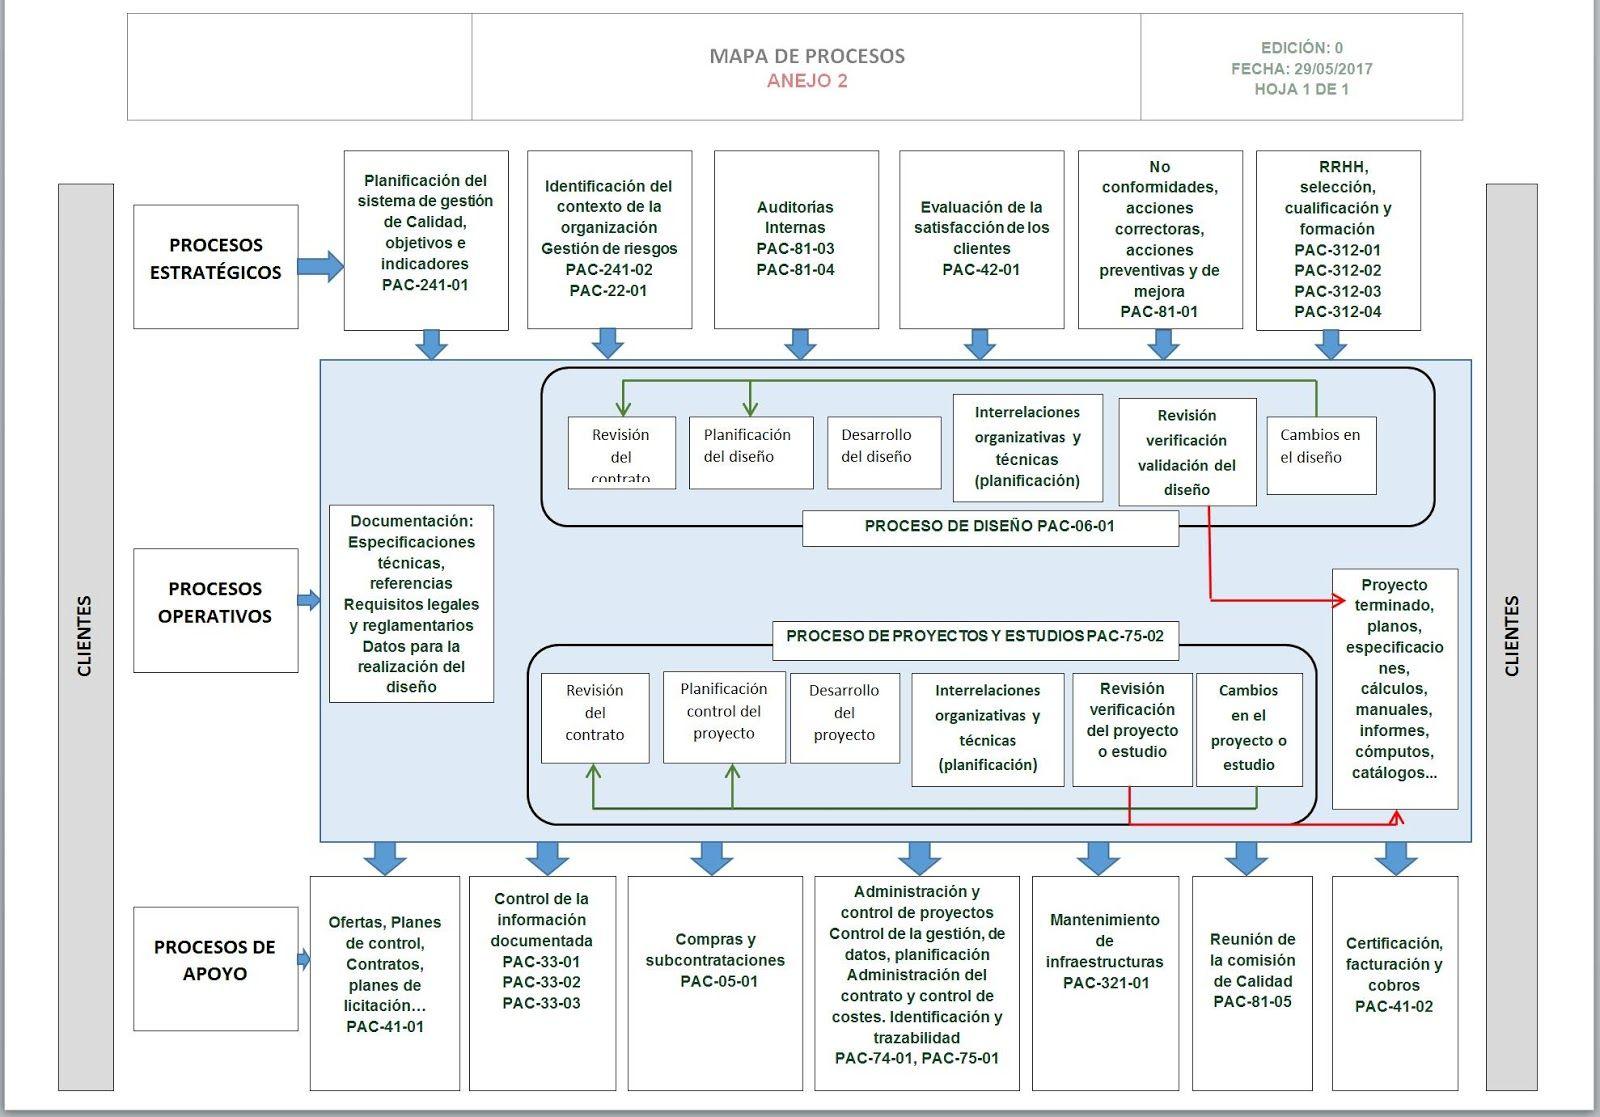 Mapa de procesos según ISO 9001:2015 | Mapas, Desarrollo organizacional,  Proceso